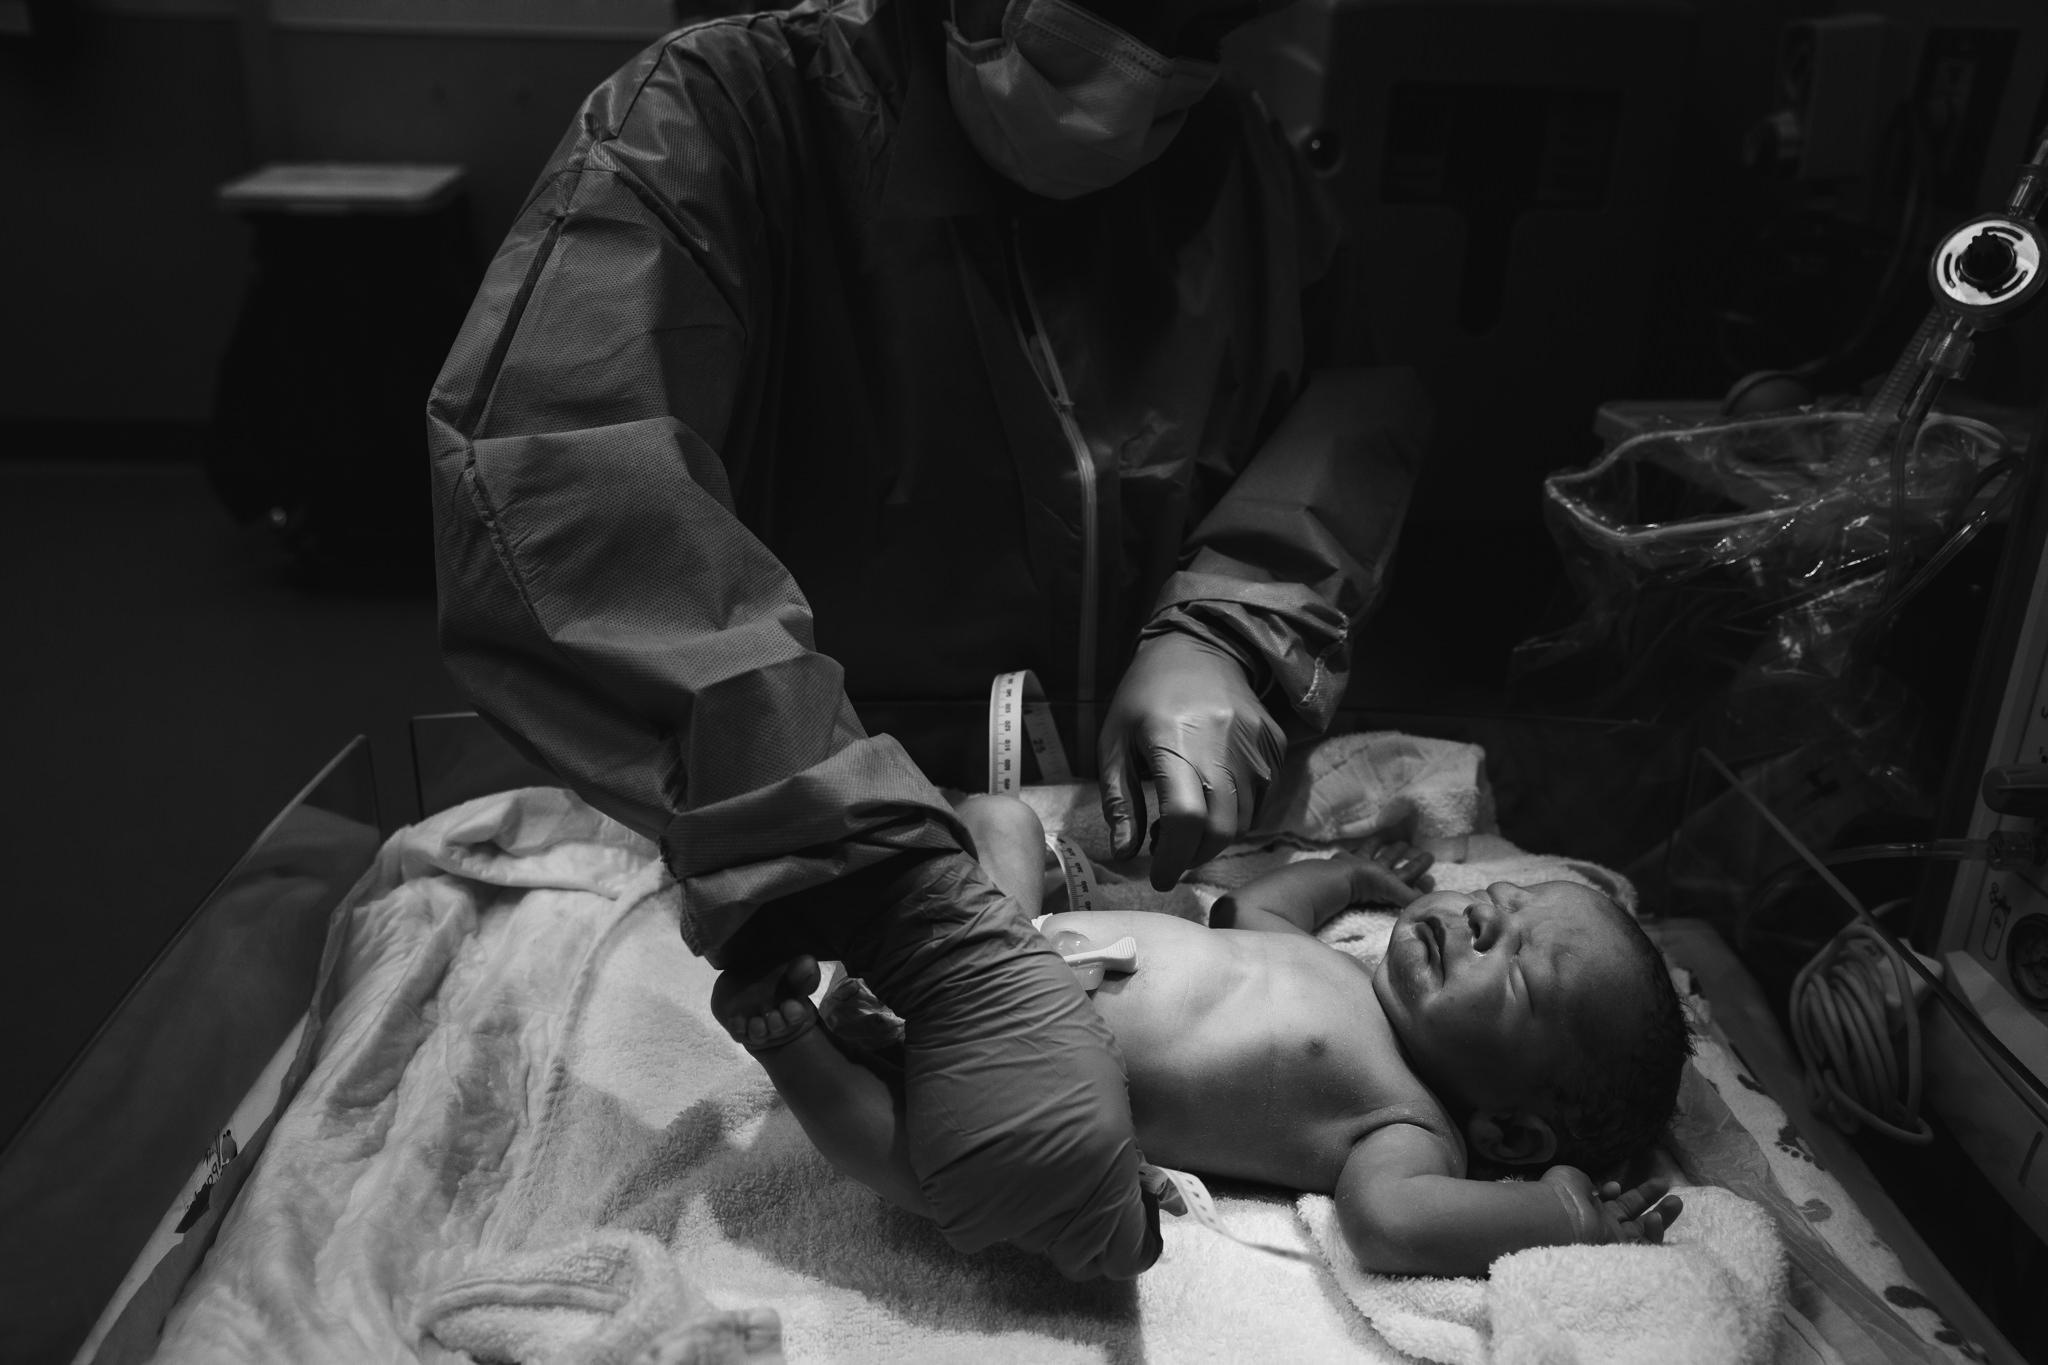 birth-photography-documentary-family-photographer-78.jpg